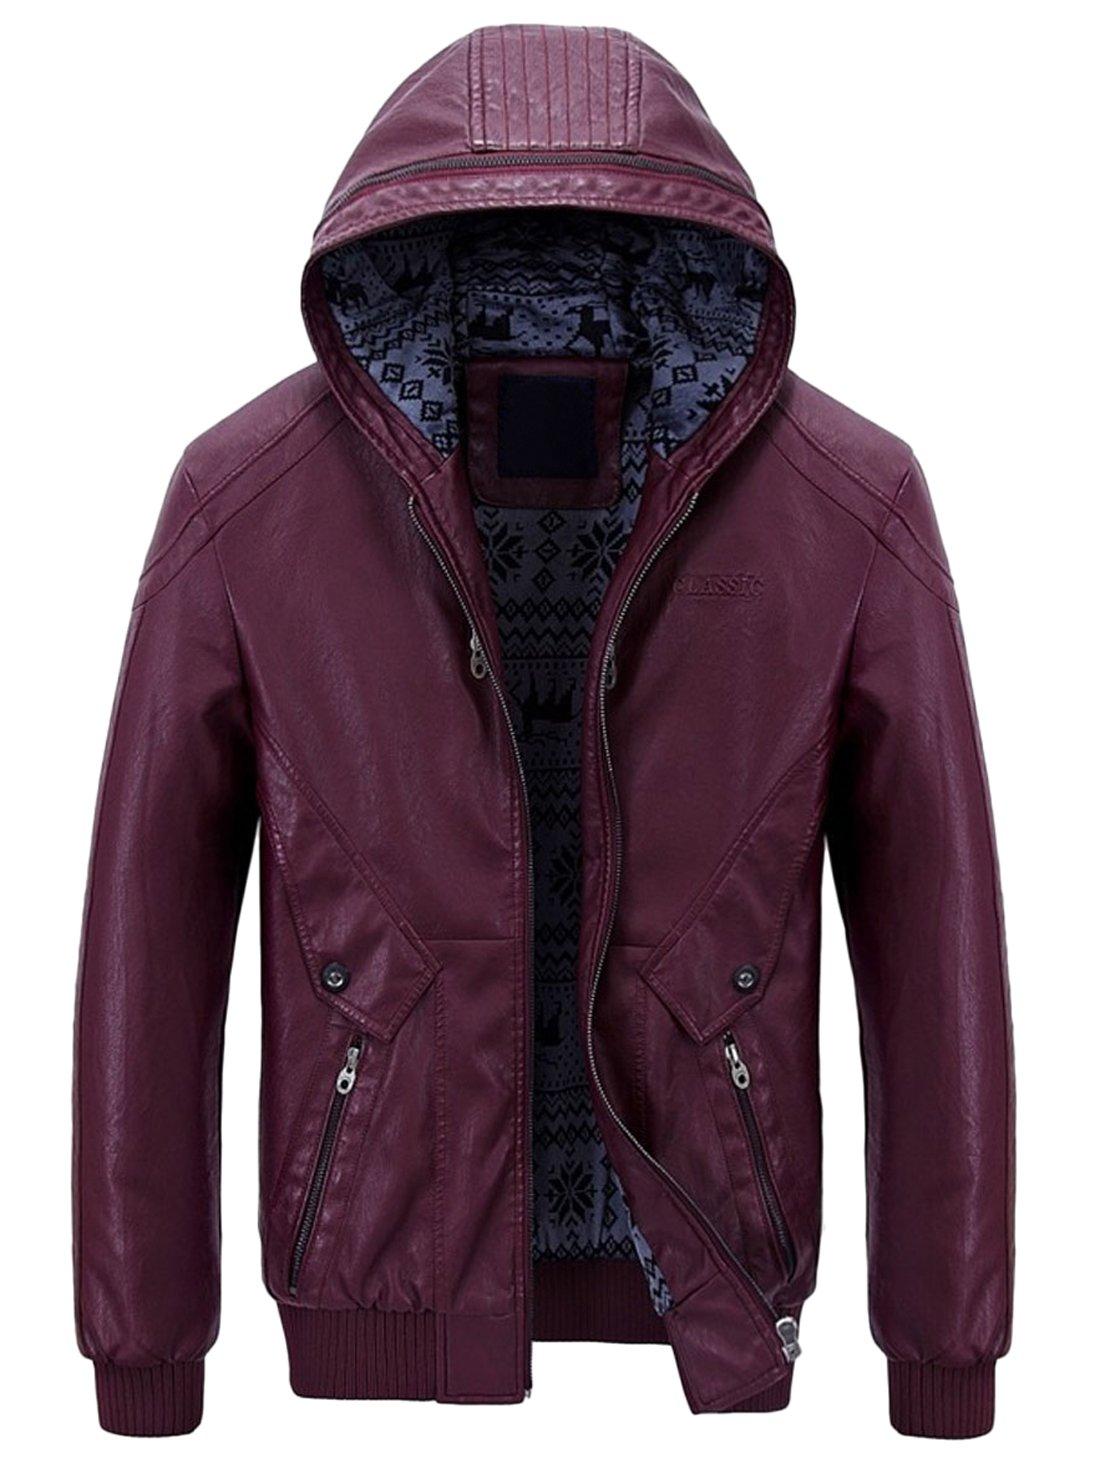 Chouyatou Men's Stylish Hooded Zip-Front Fleece Lined Moto PU Leather Bomber Jackets (X-Large, Wine Red) by Chouyatou